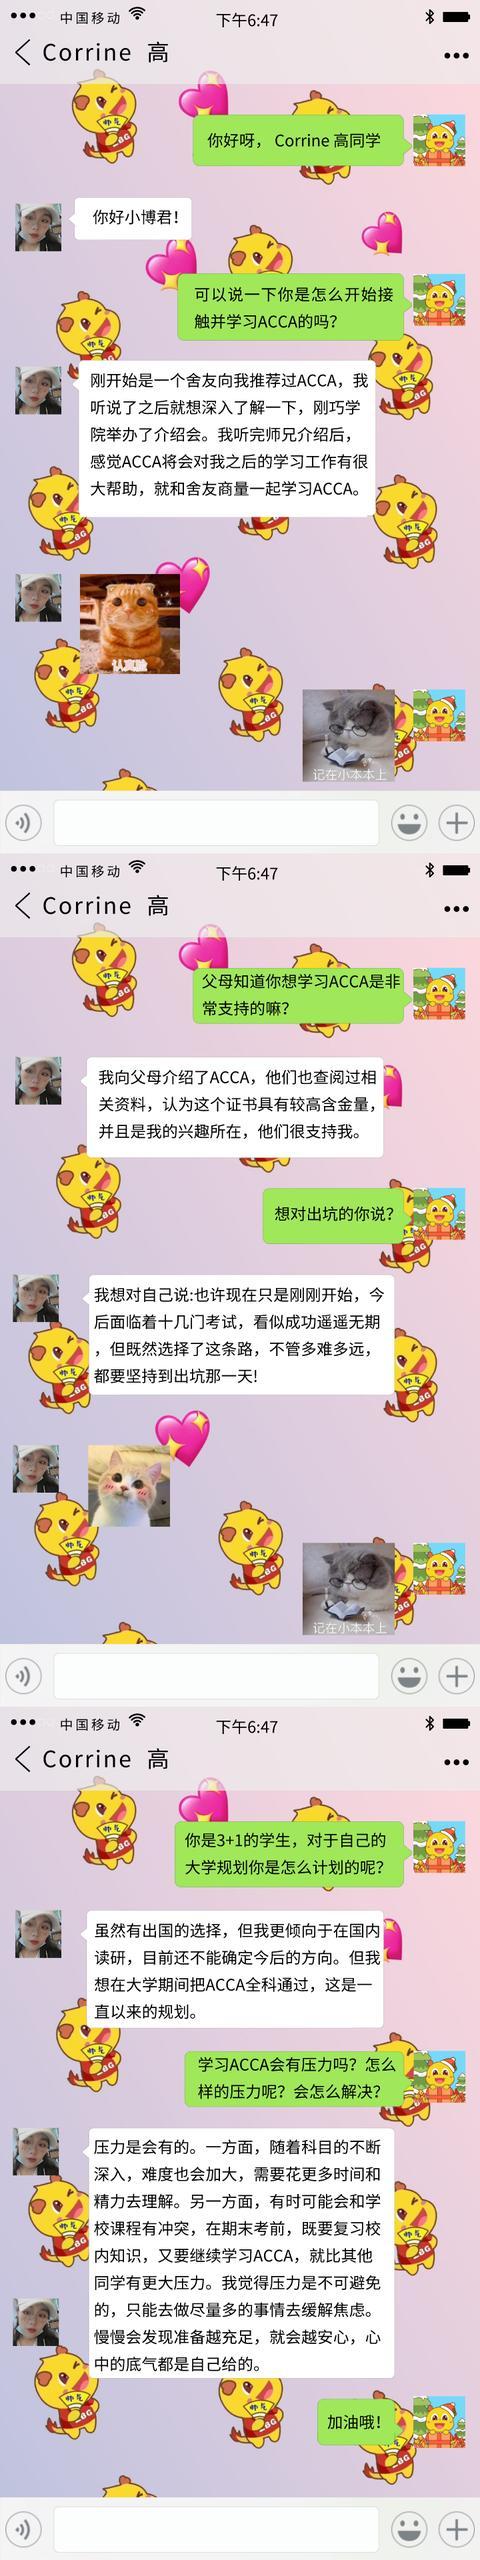 ACCA学员分享:ACCA是鞭策我前进的动力